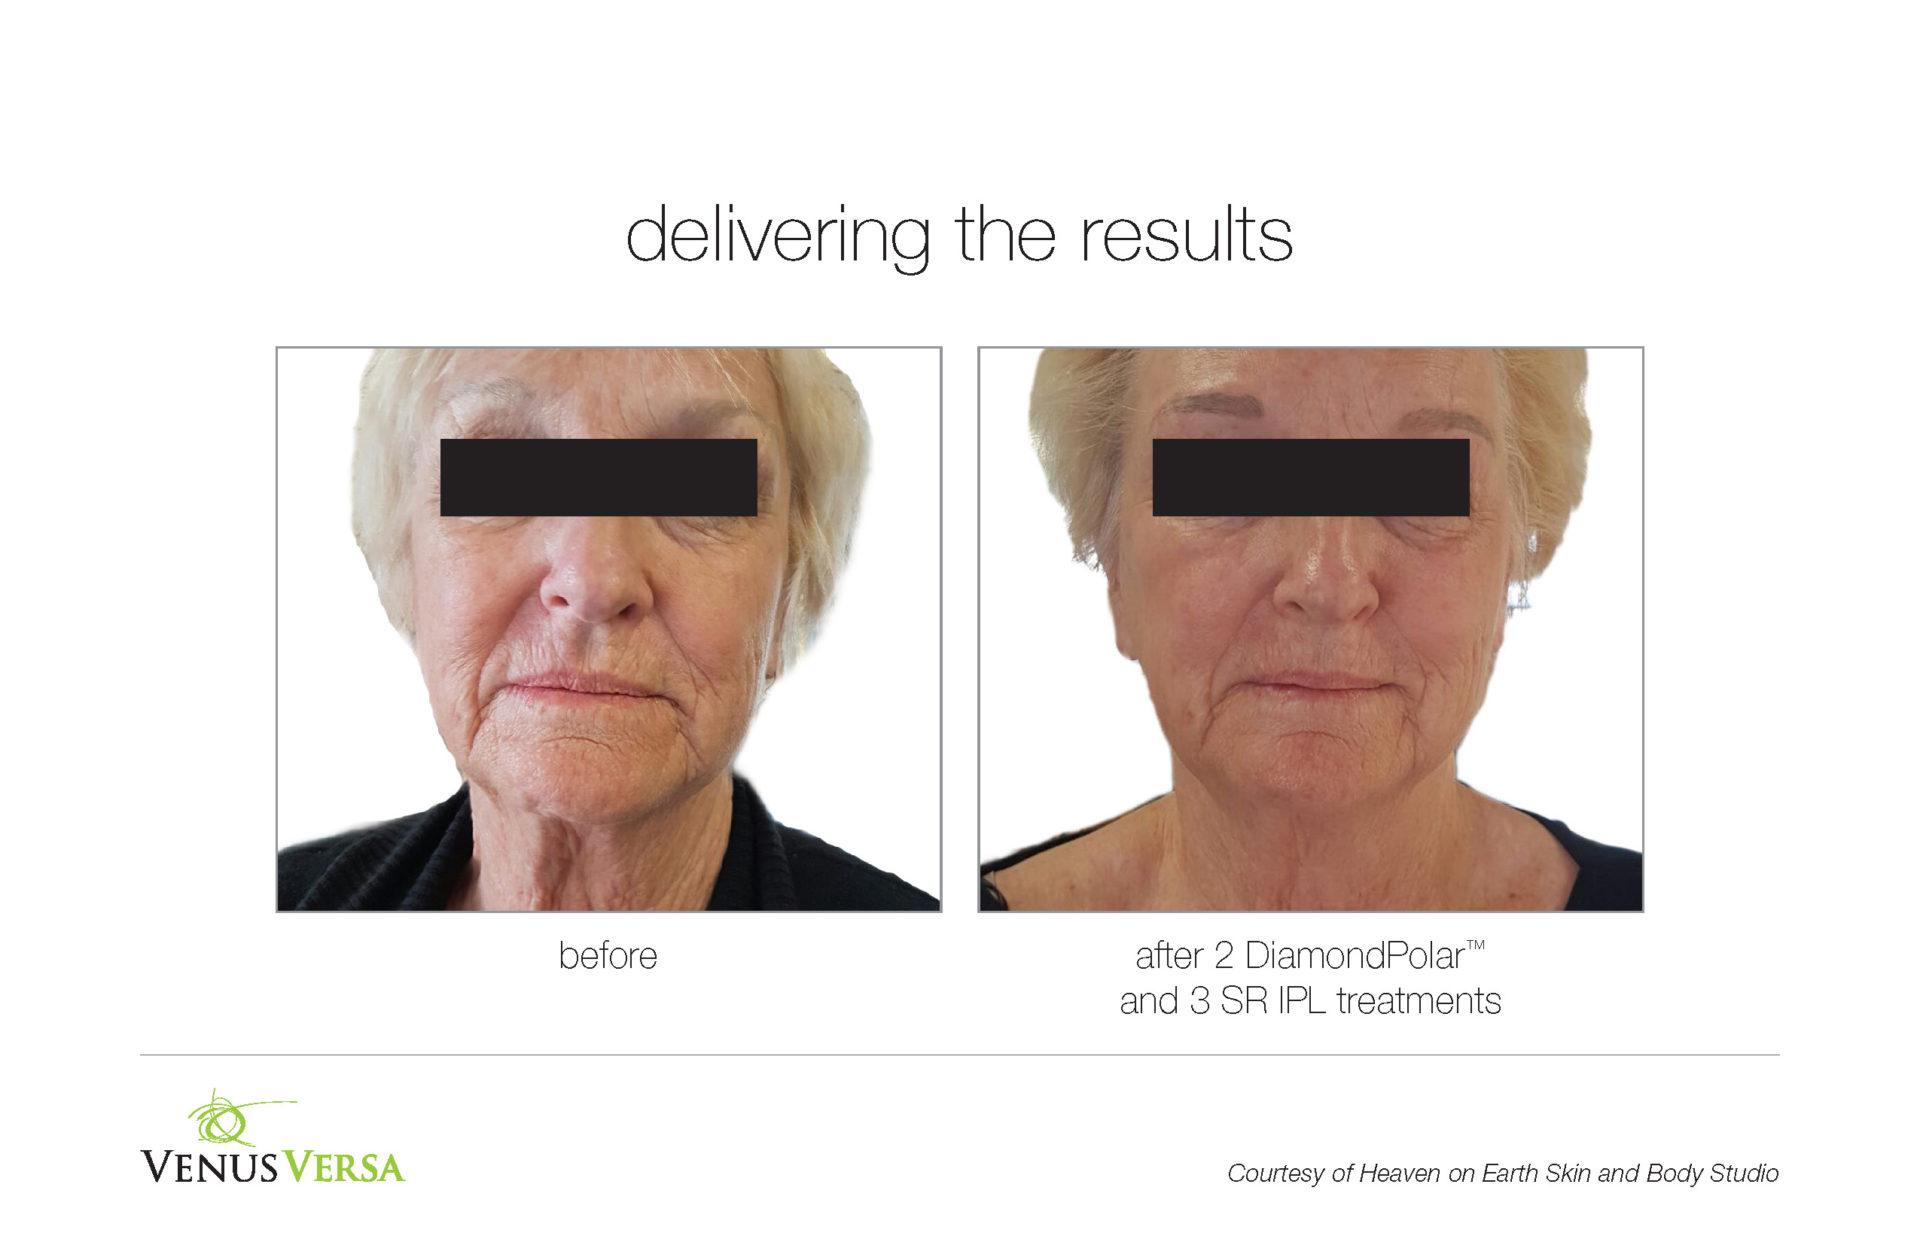 VenusVersa Wrinkle Reduction Treatments In Hertfordshire and Essex